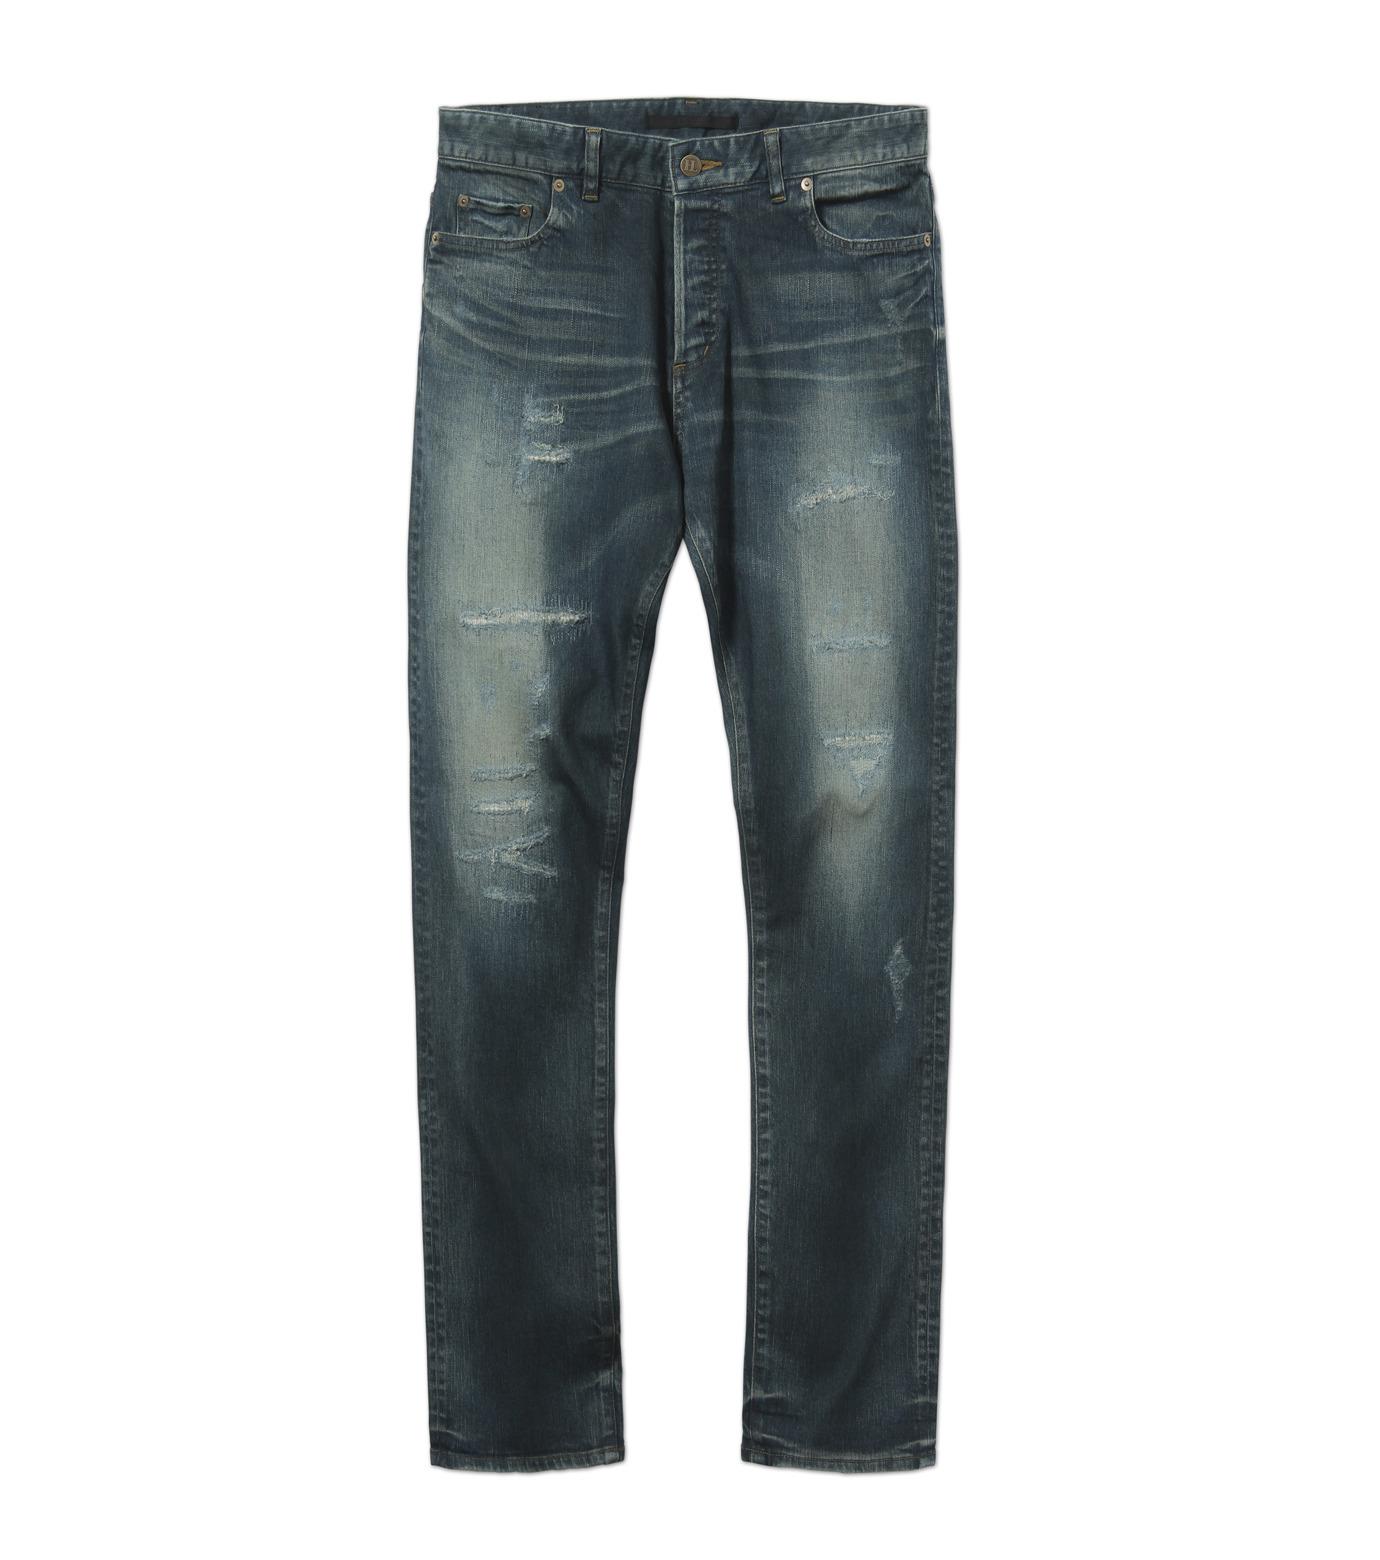 HL HEDDIE LOVU(エイチエル・エディールーヴ)のIND Dark Damage-INDIGO(パンツ/pants)-17A98006-94 拡大詳細画像4